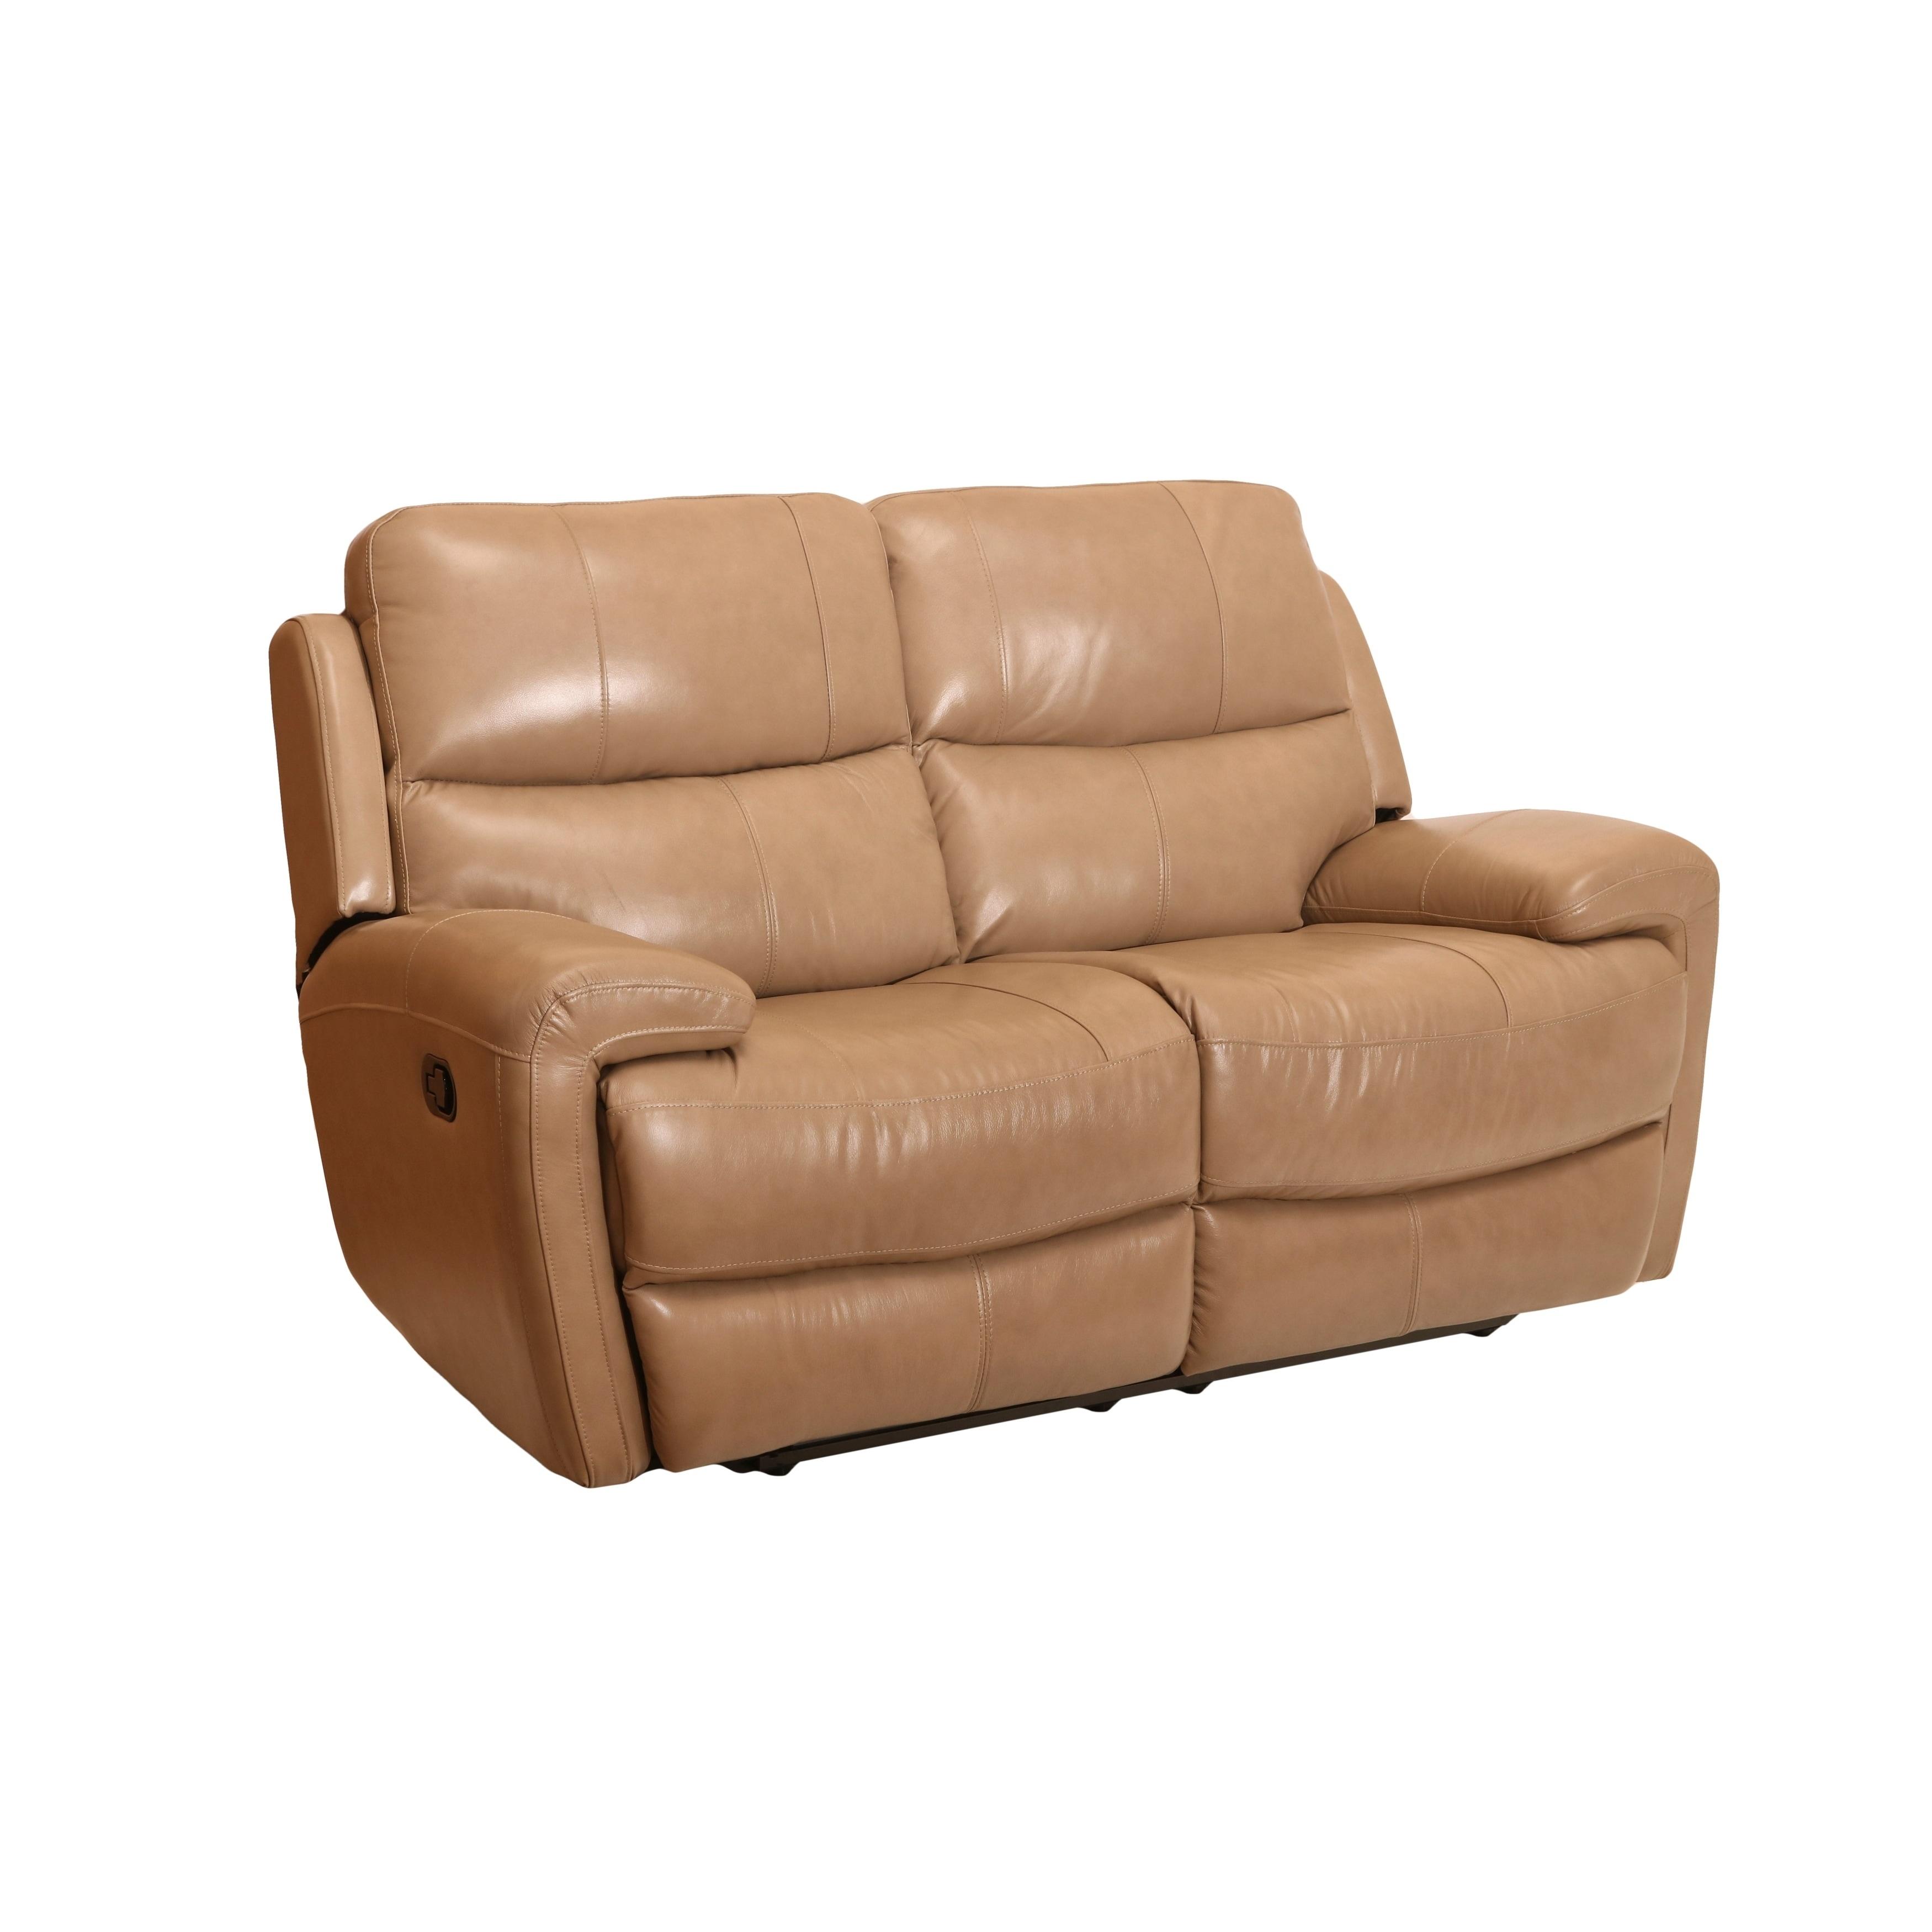 multi set accent sofa chair loveseat and tan living tn piece cambridge haverhill room sets p